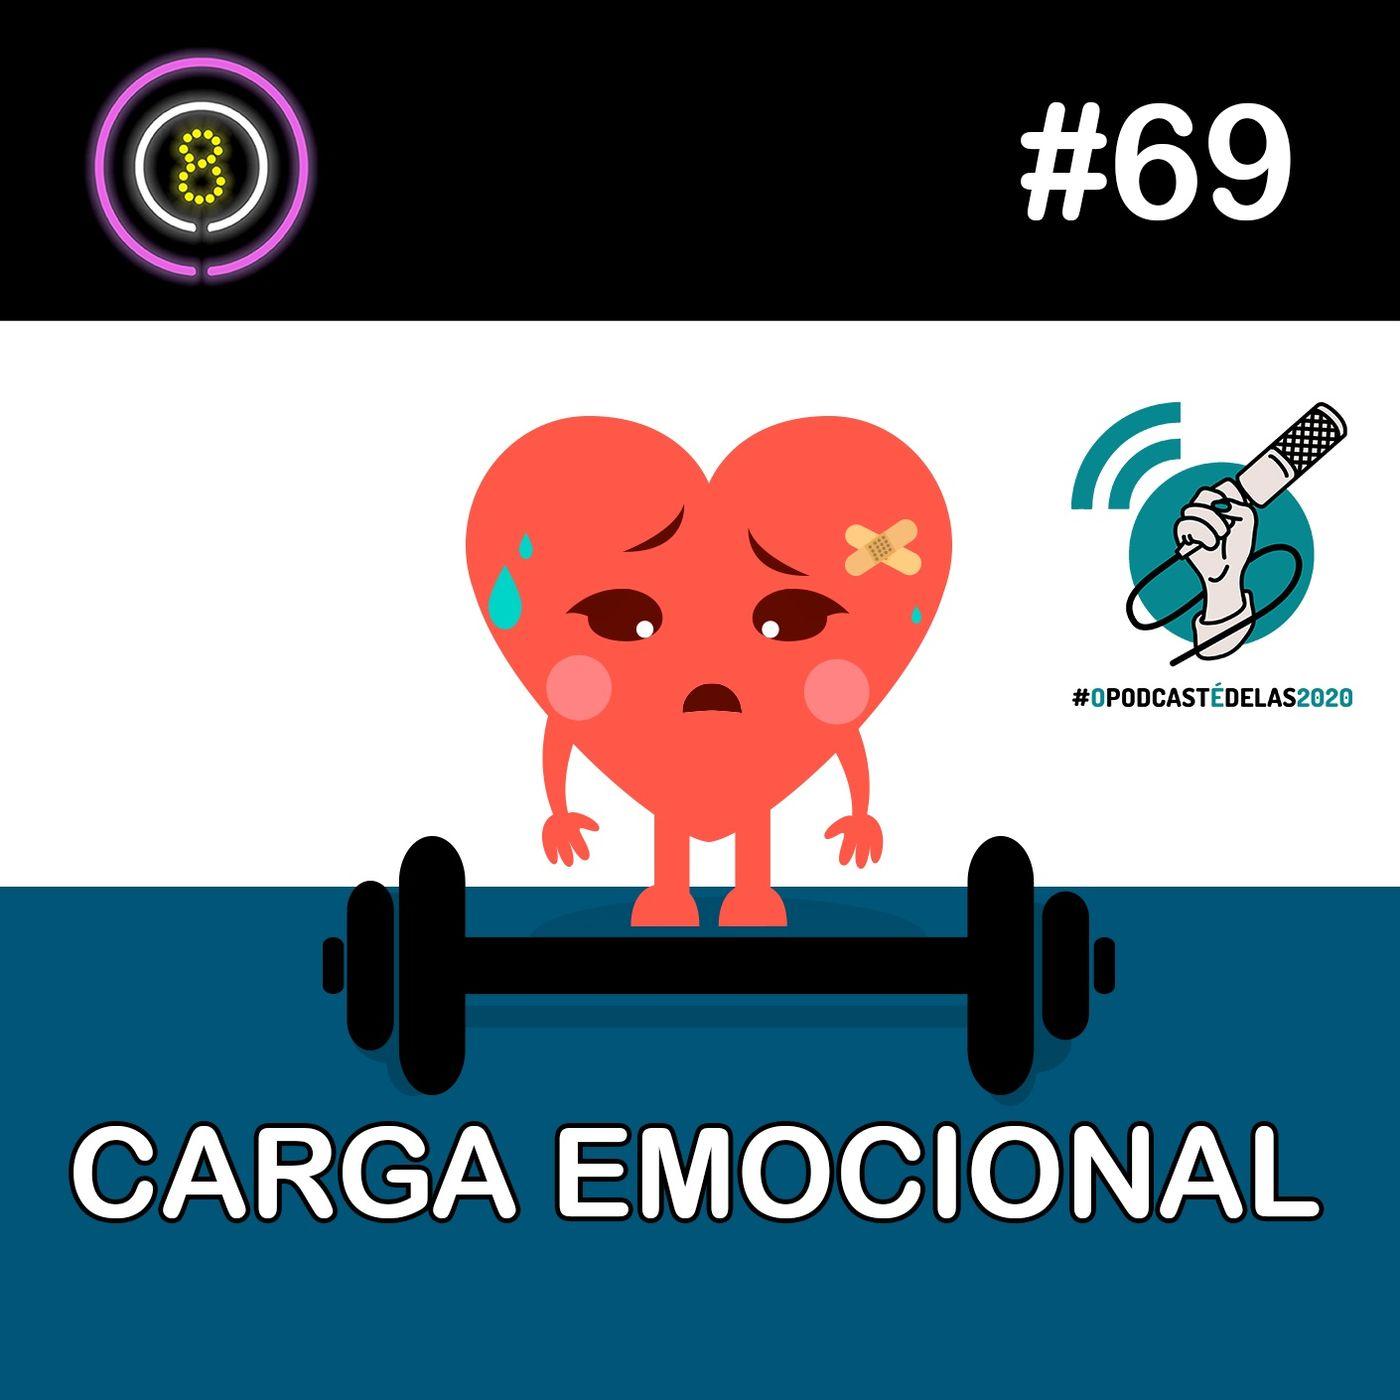 #69 - Carga Emocional #opodcastédelas